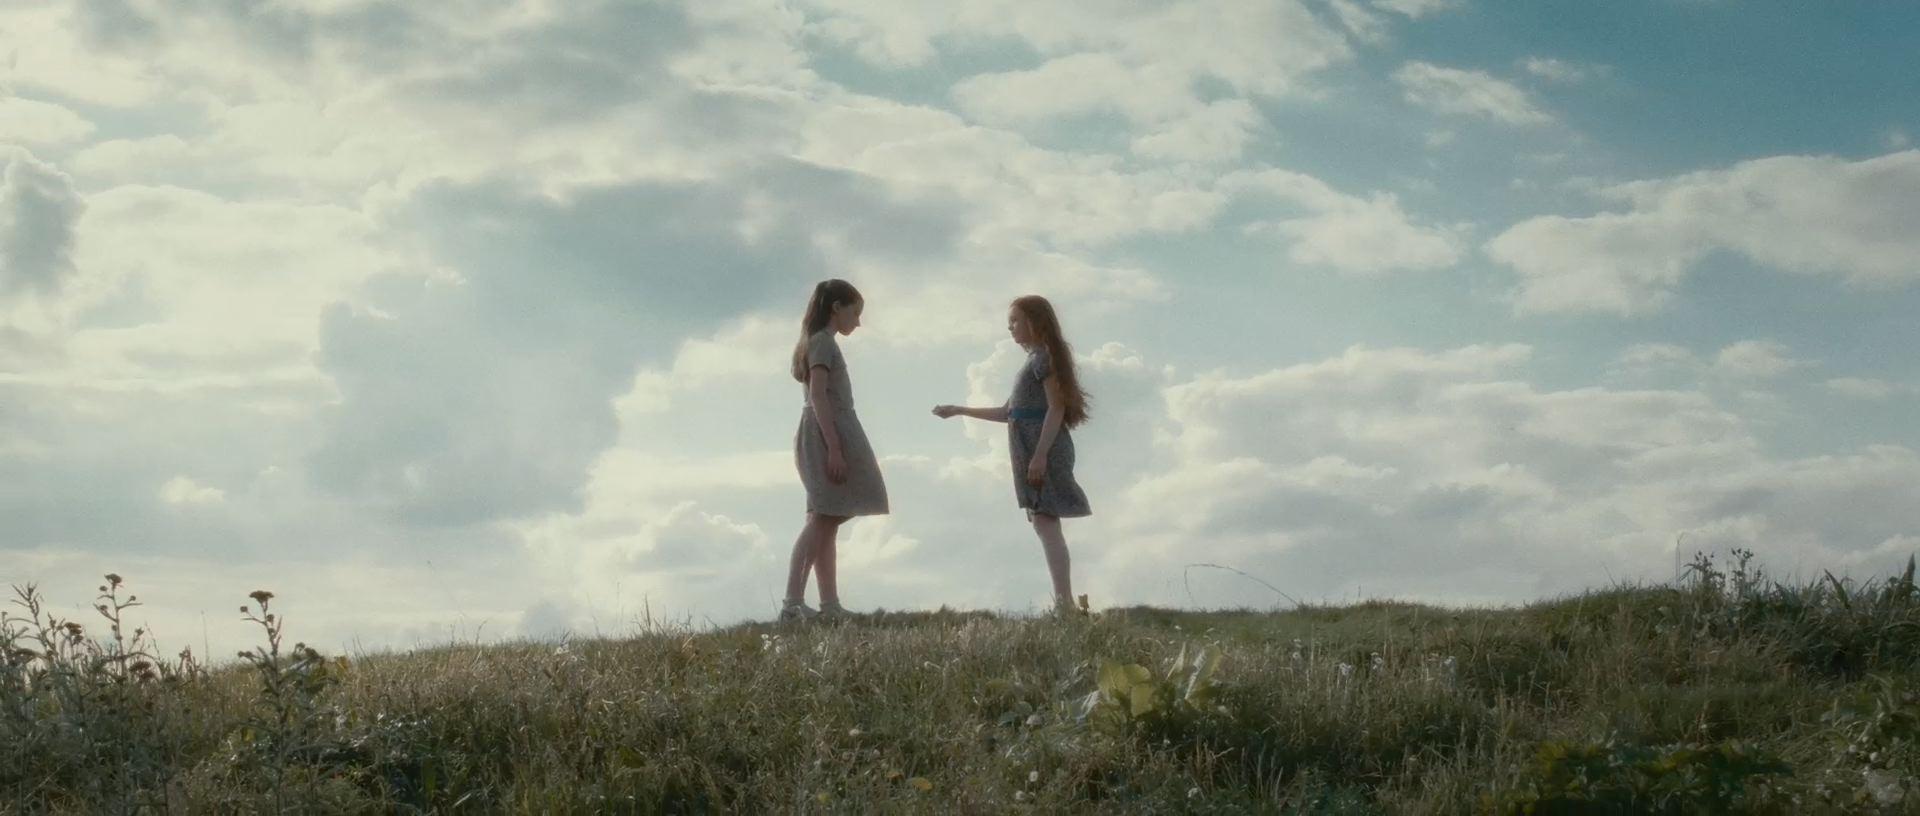 Harry Potter BlogHogwarts HP7 2 Trailer 03